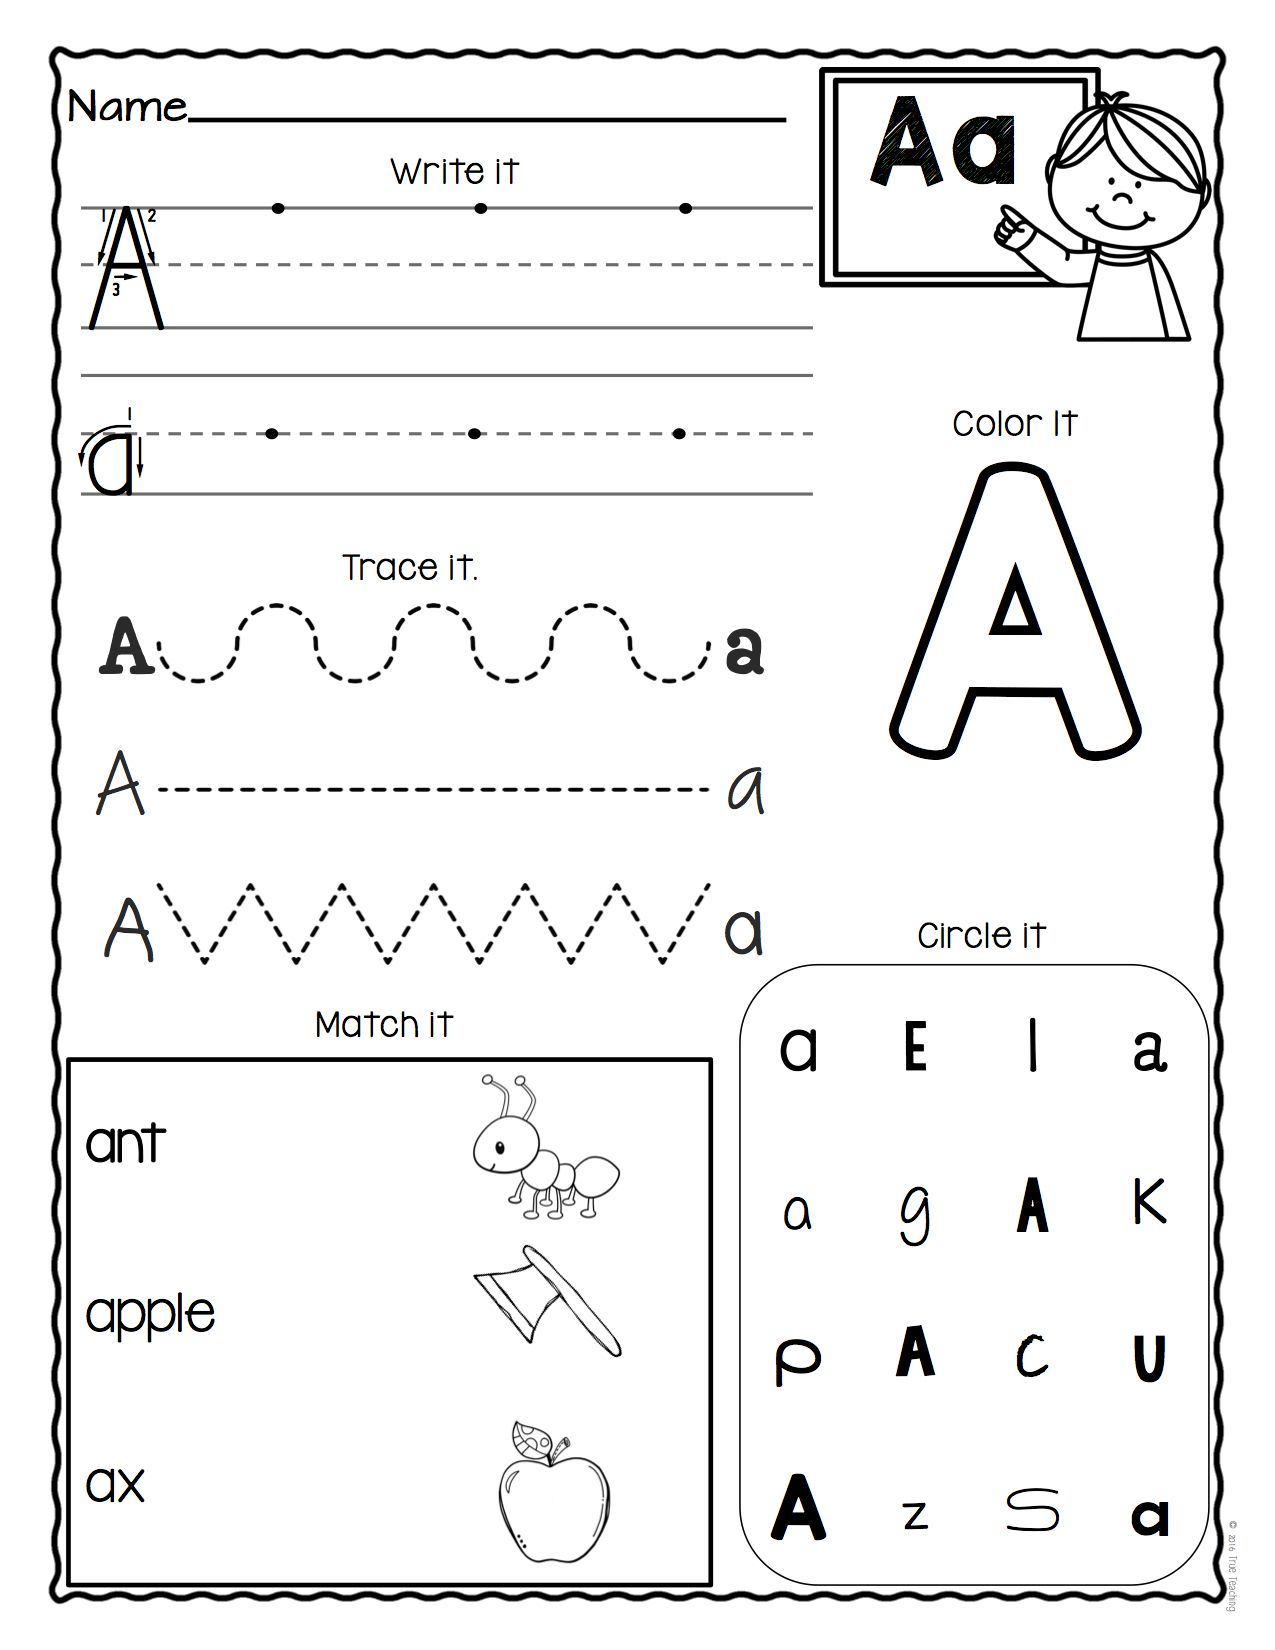 A-Z Letter Worksheetstrue Teaching | Alphabet Worksheets intended for Pre K Alphabet Worksheets